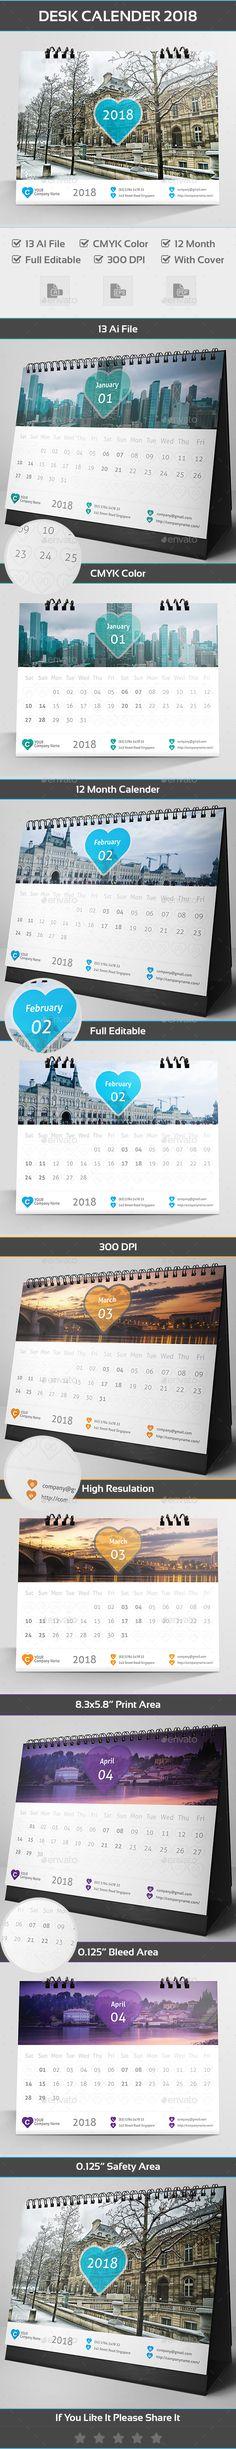 2018 Calendar Template Calendar Design And Print Templates